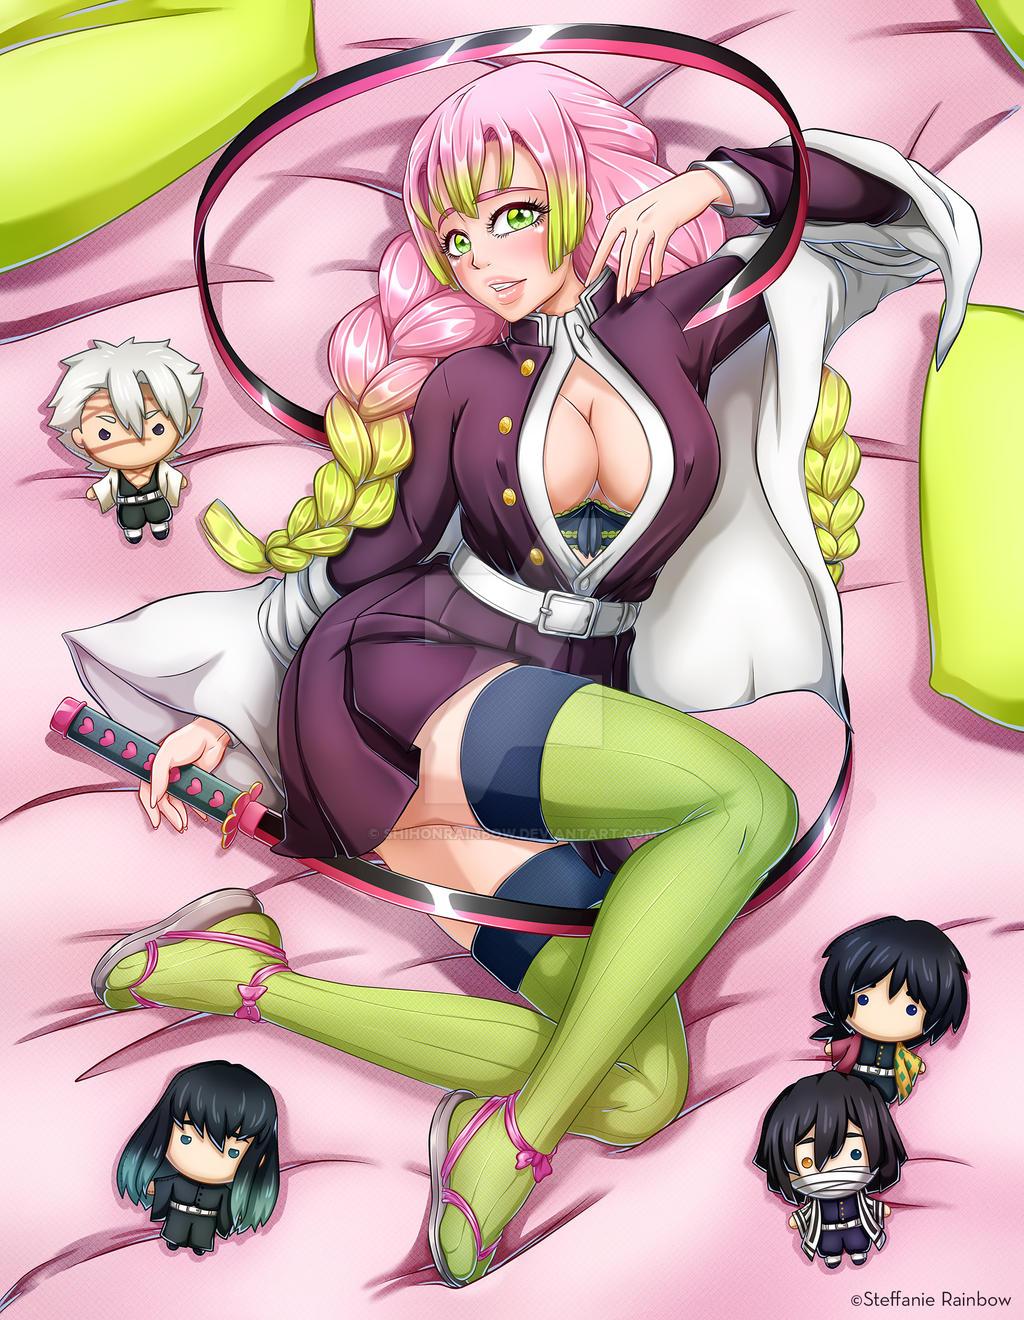 Mitsuri from Demon Slayer